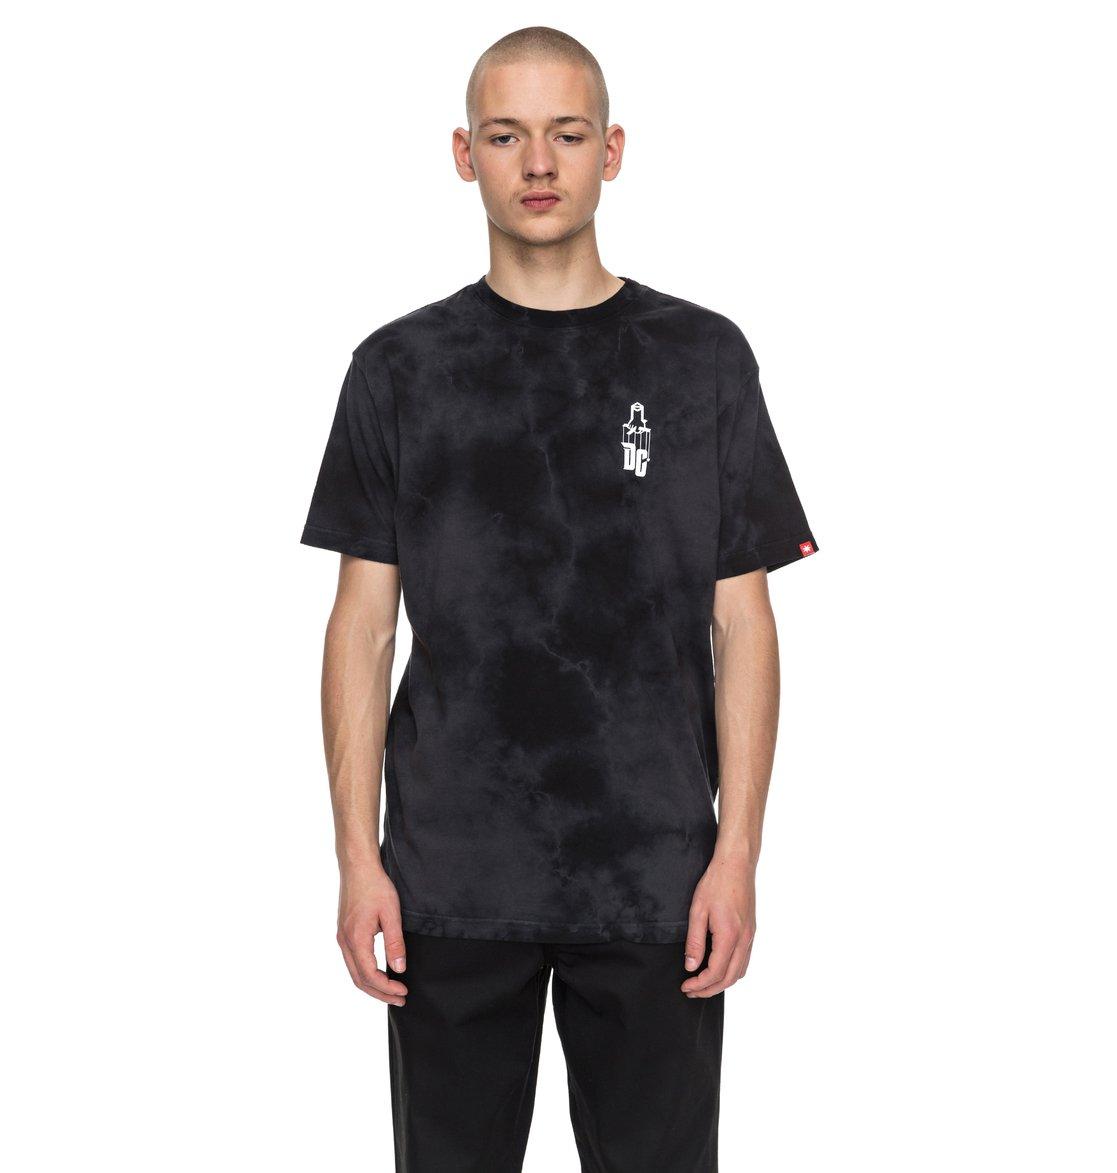 Tee Shirt Sk8 Mafia Texture Black - DC Shoes 6SZKR